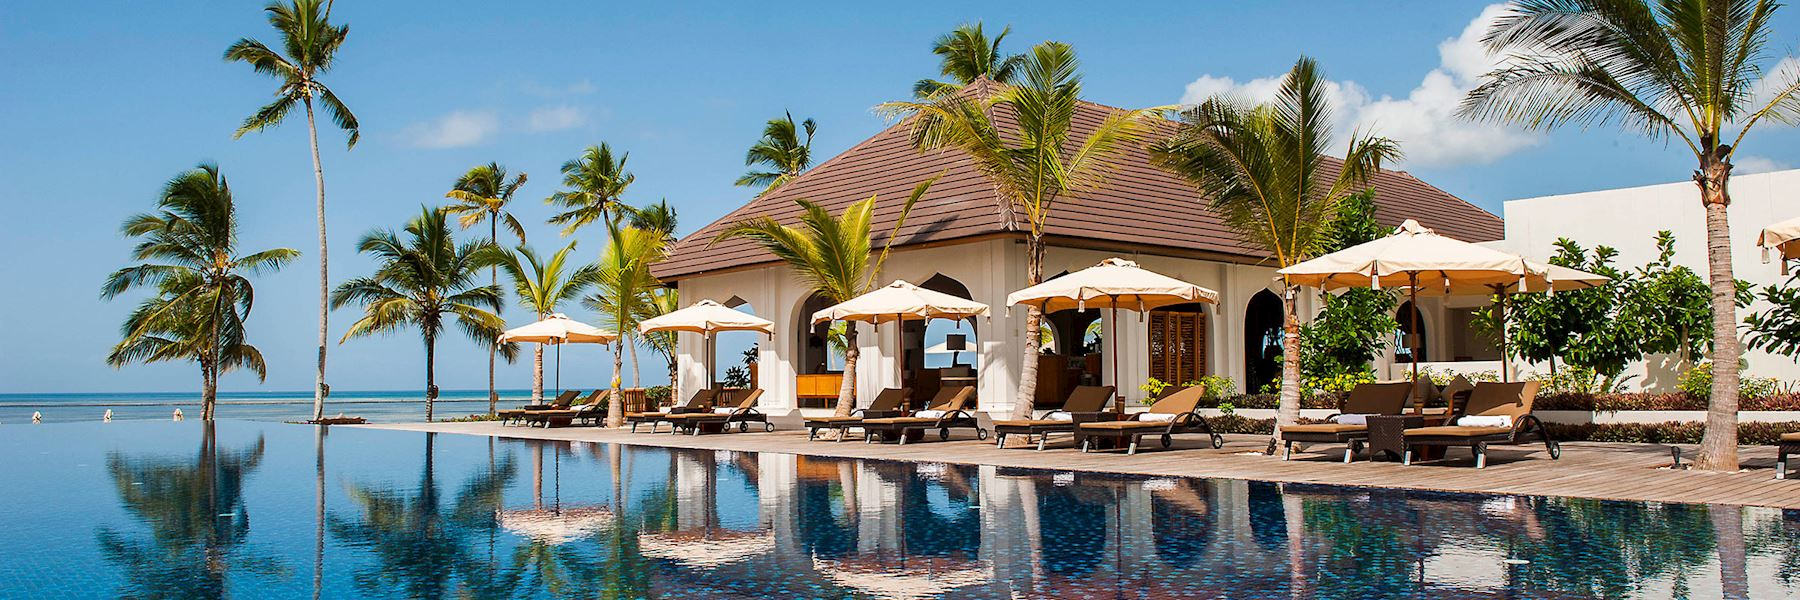 Accommodation in Zanzibar Archipelago